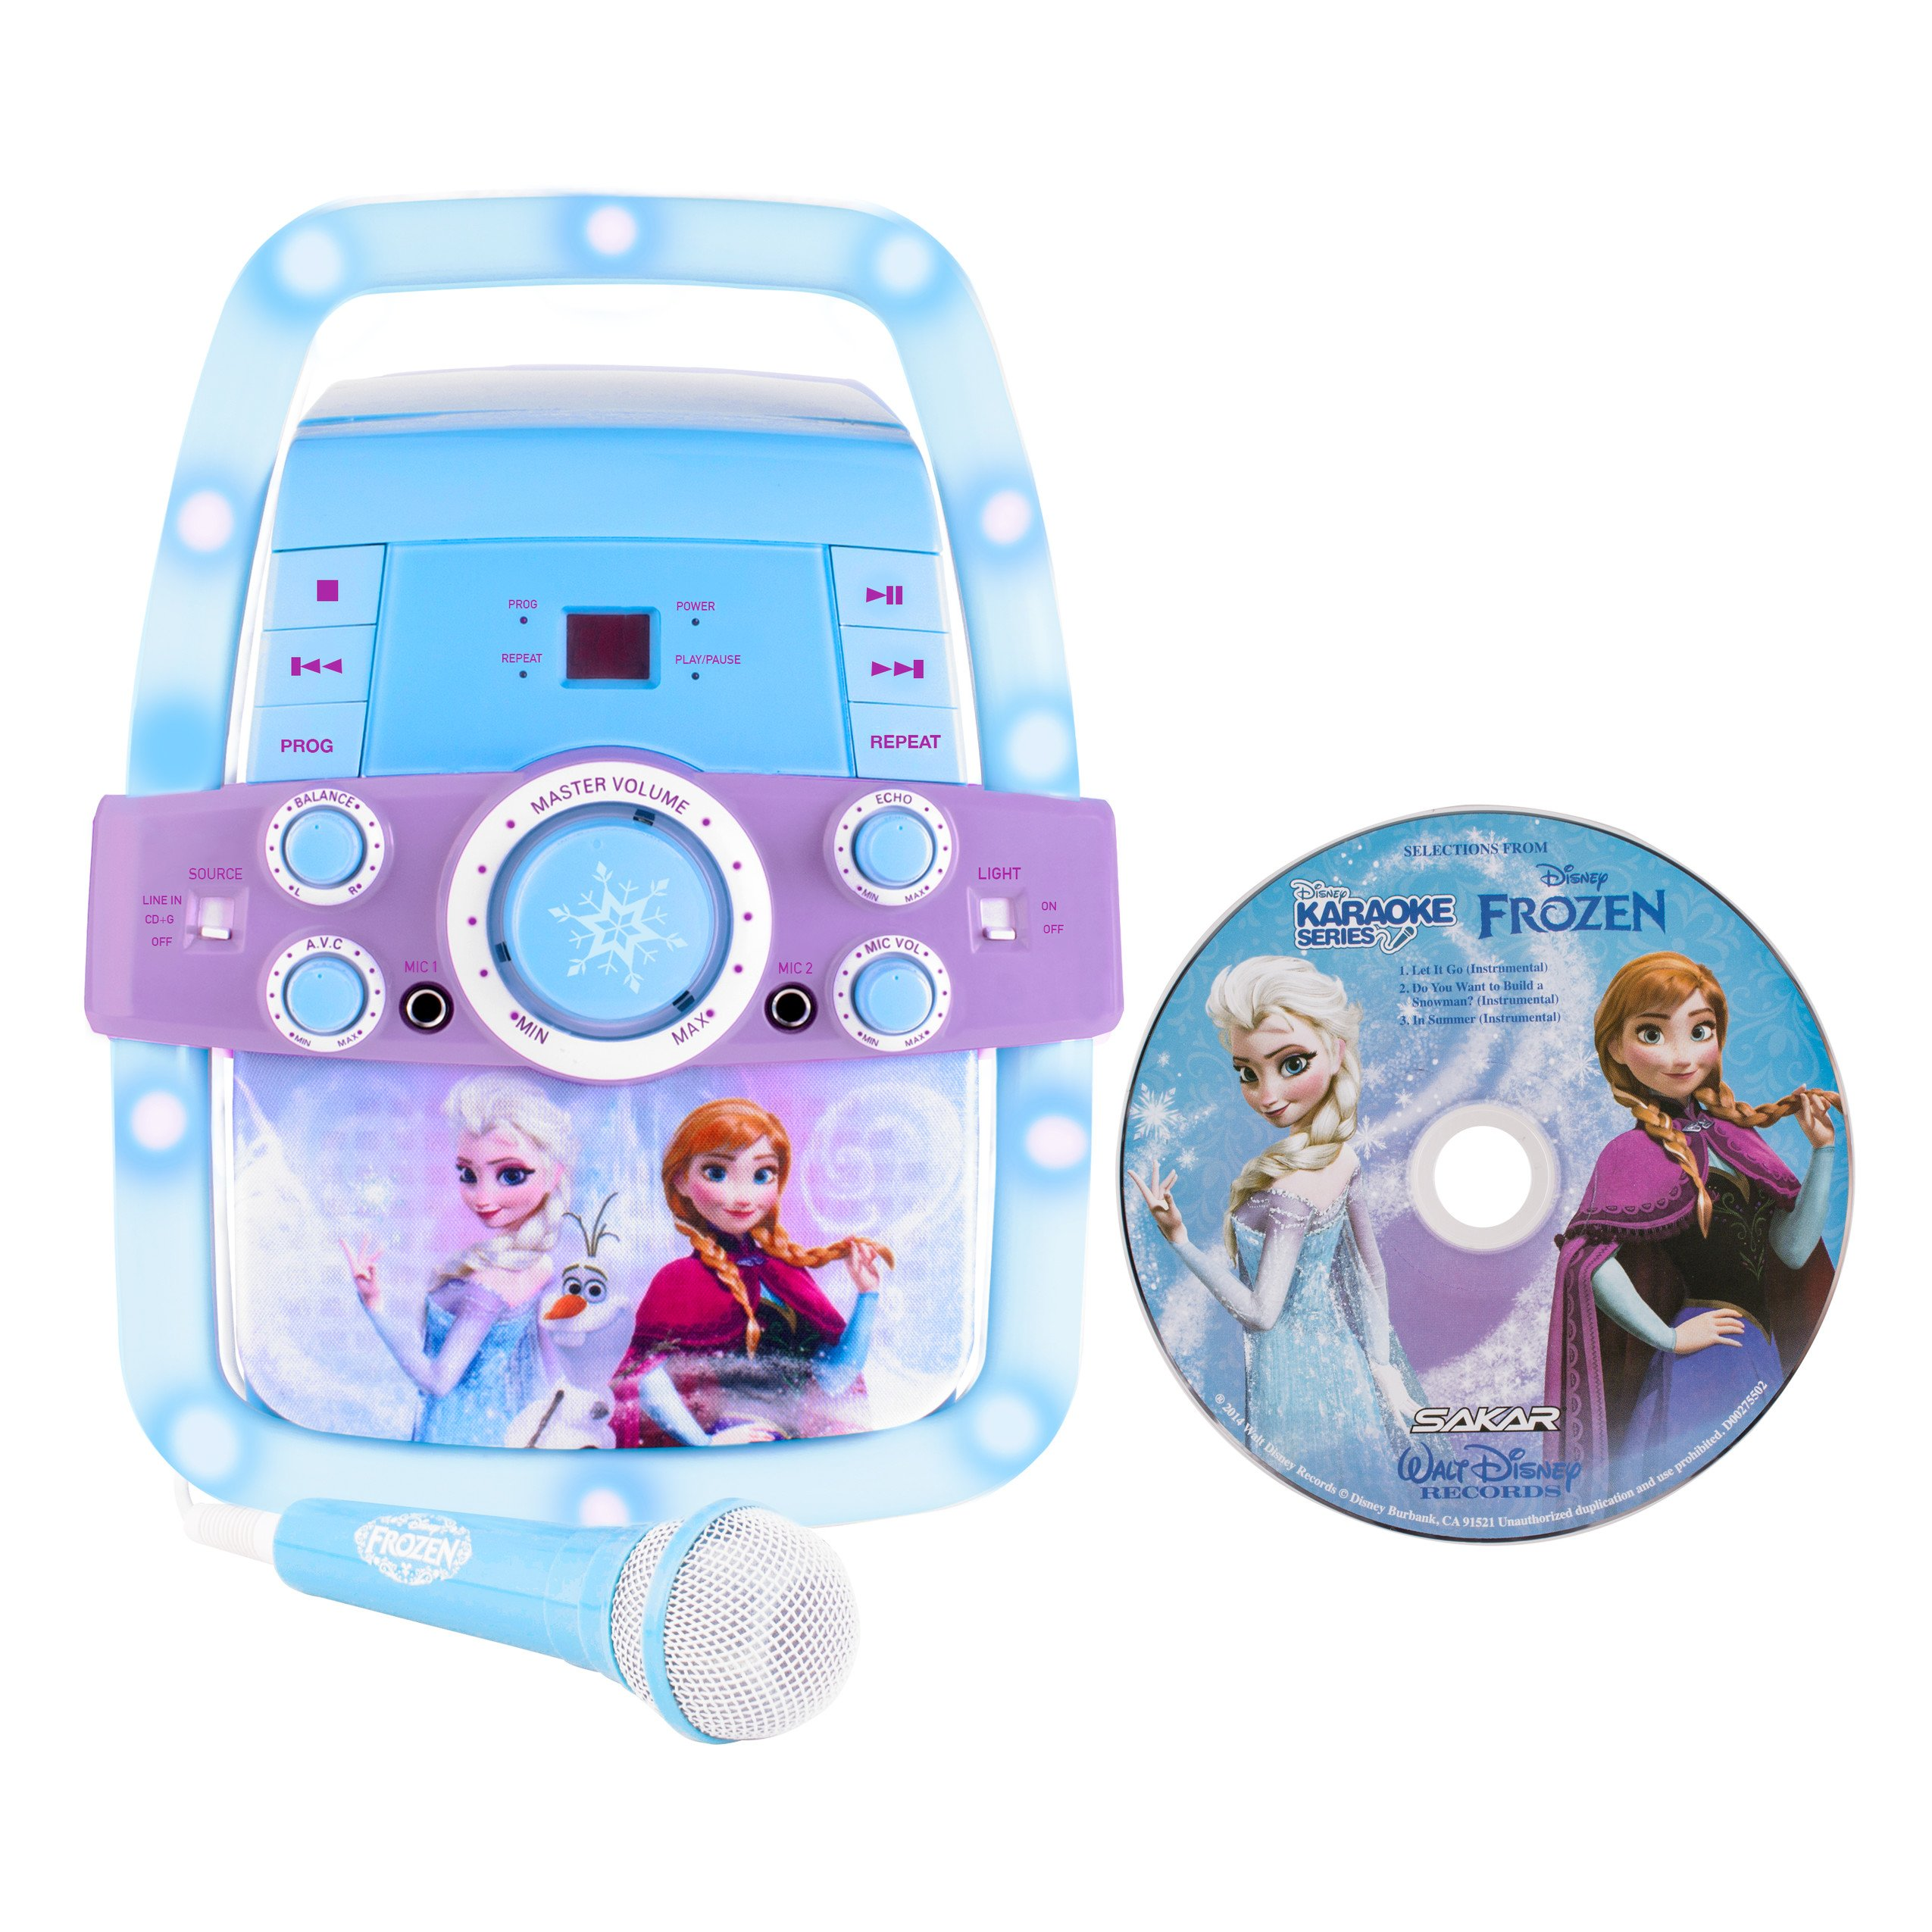 Disney Frozen Karaoke Set (Amazon Exclusive)